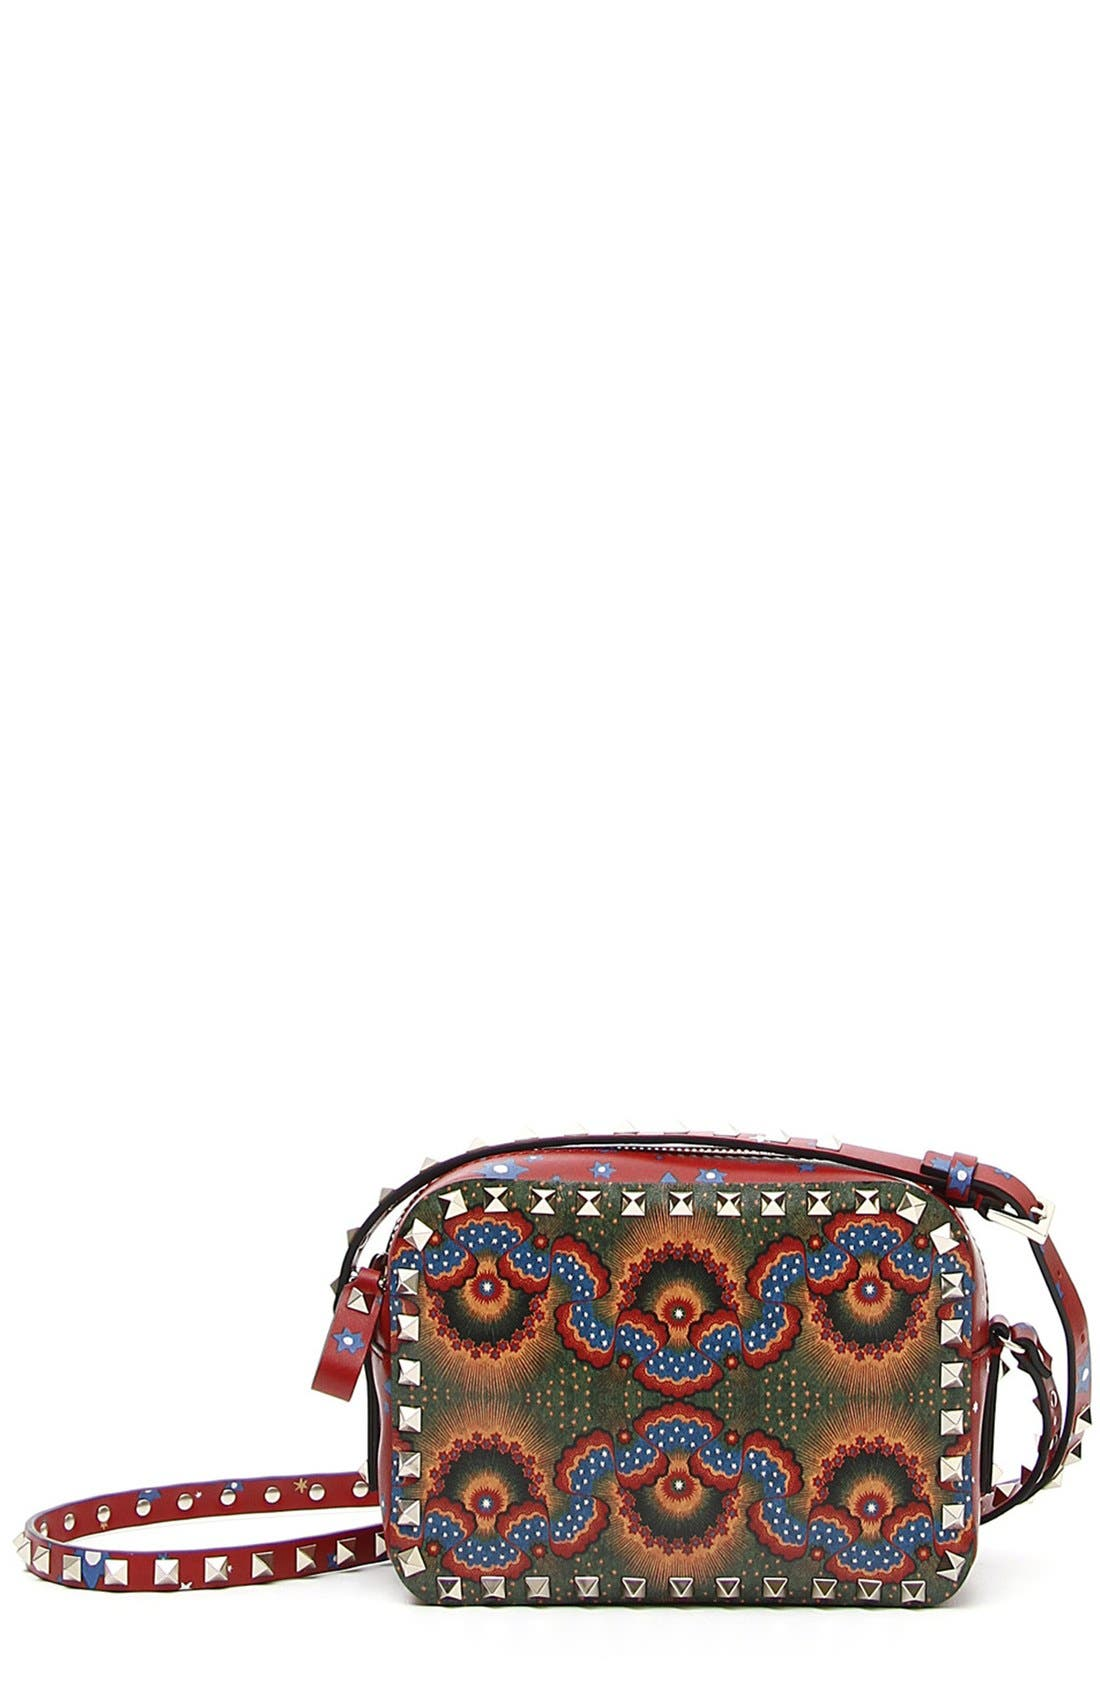 'Rockstud - Enchanted Wonderland' Calfskin Leather Camera Crossbody Bag,                         Main,                         color, Rosso